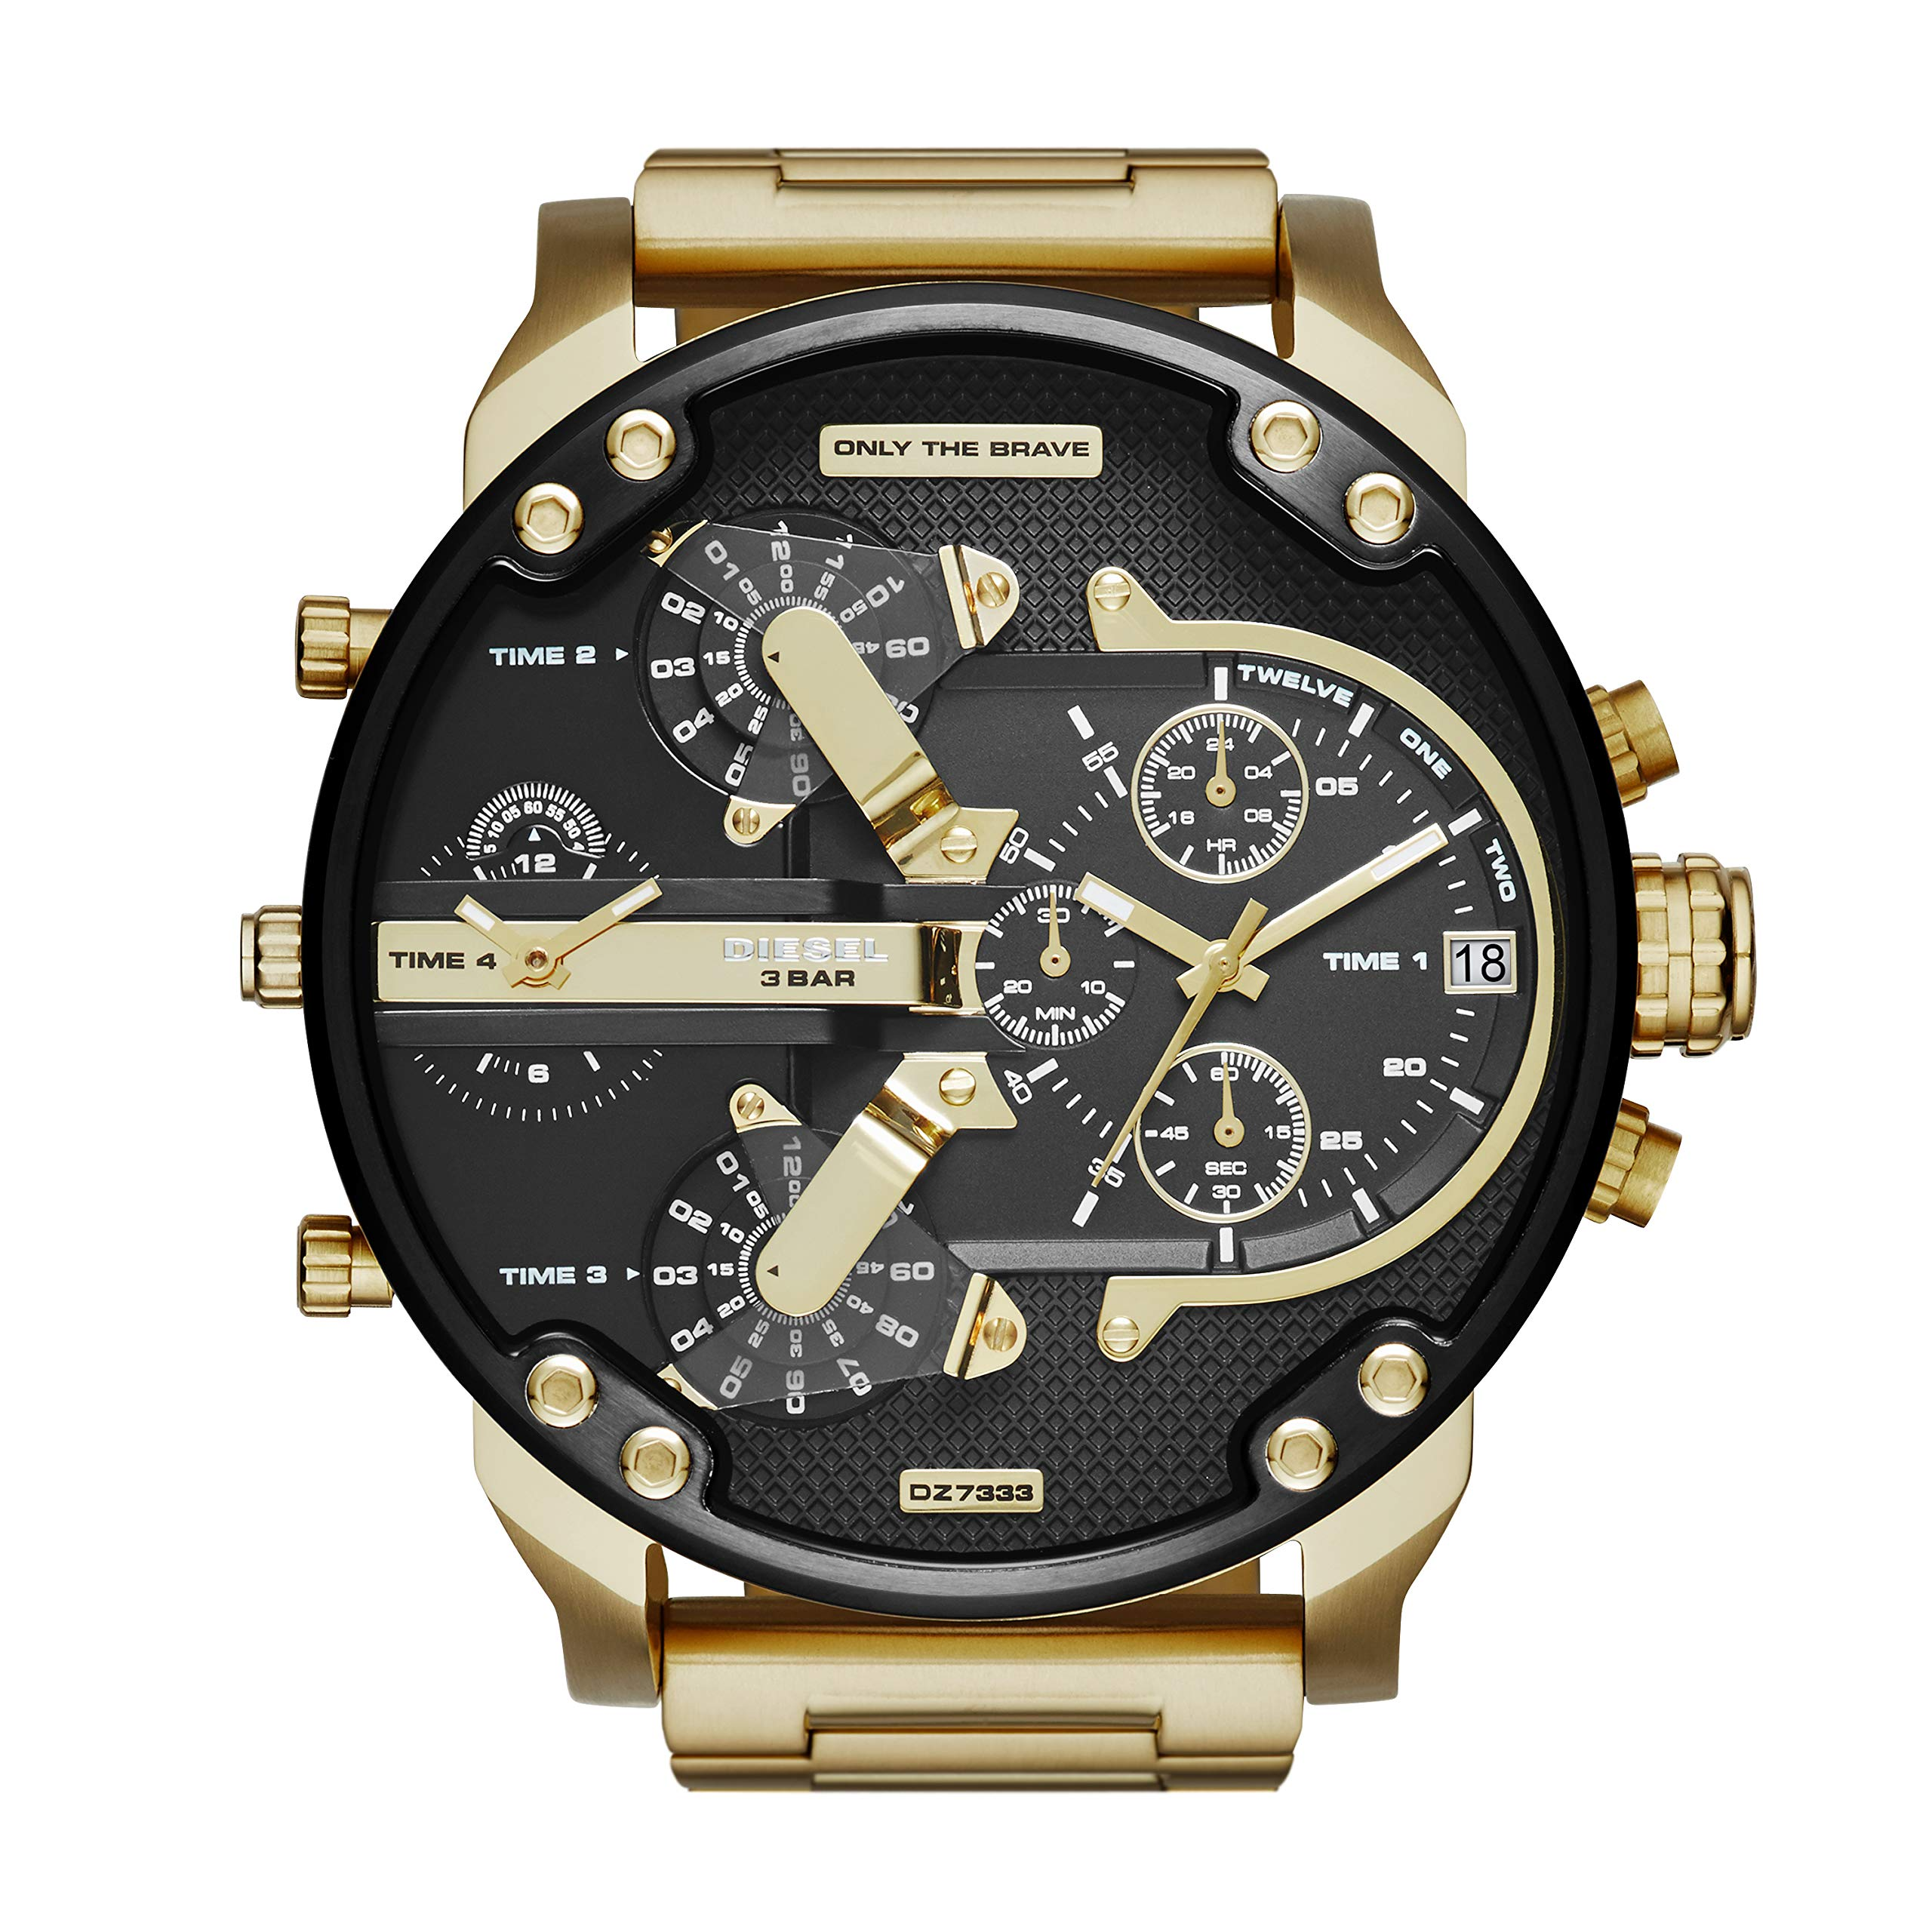 Diesel Men's Mr Daddy 2.0 Quartz Stainless Steel Chronograph Watch, Color: Gold-Tone (Model: DZ7333) by Diesel